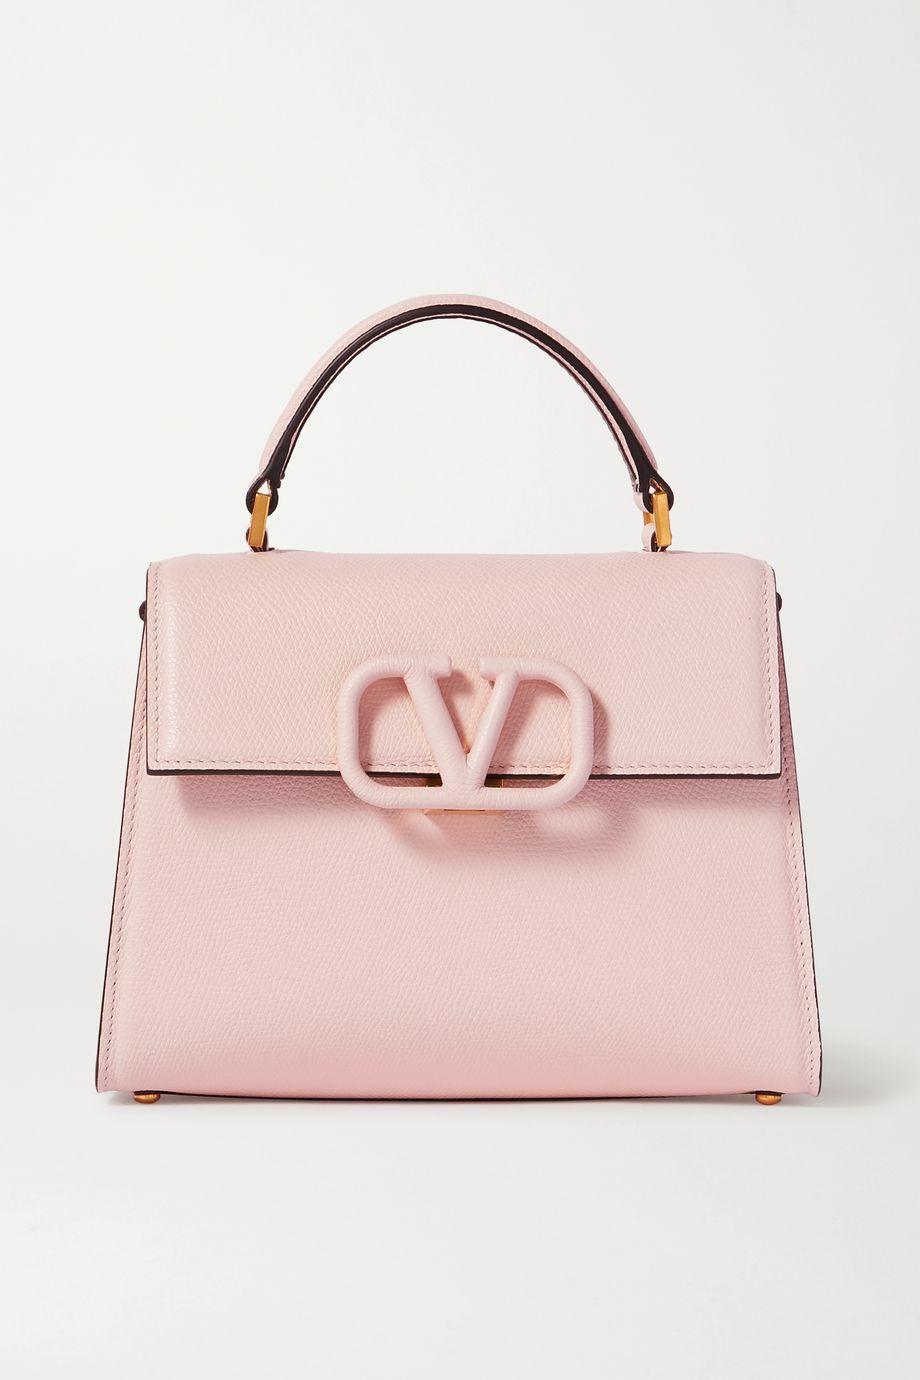 Valentino Valentino Garavani VSLING small textured-leather shoulder bag